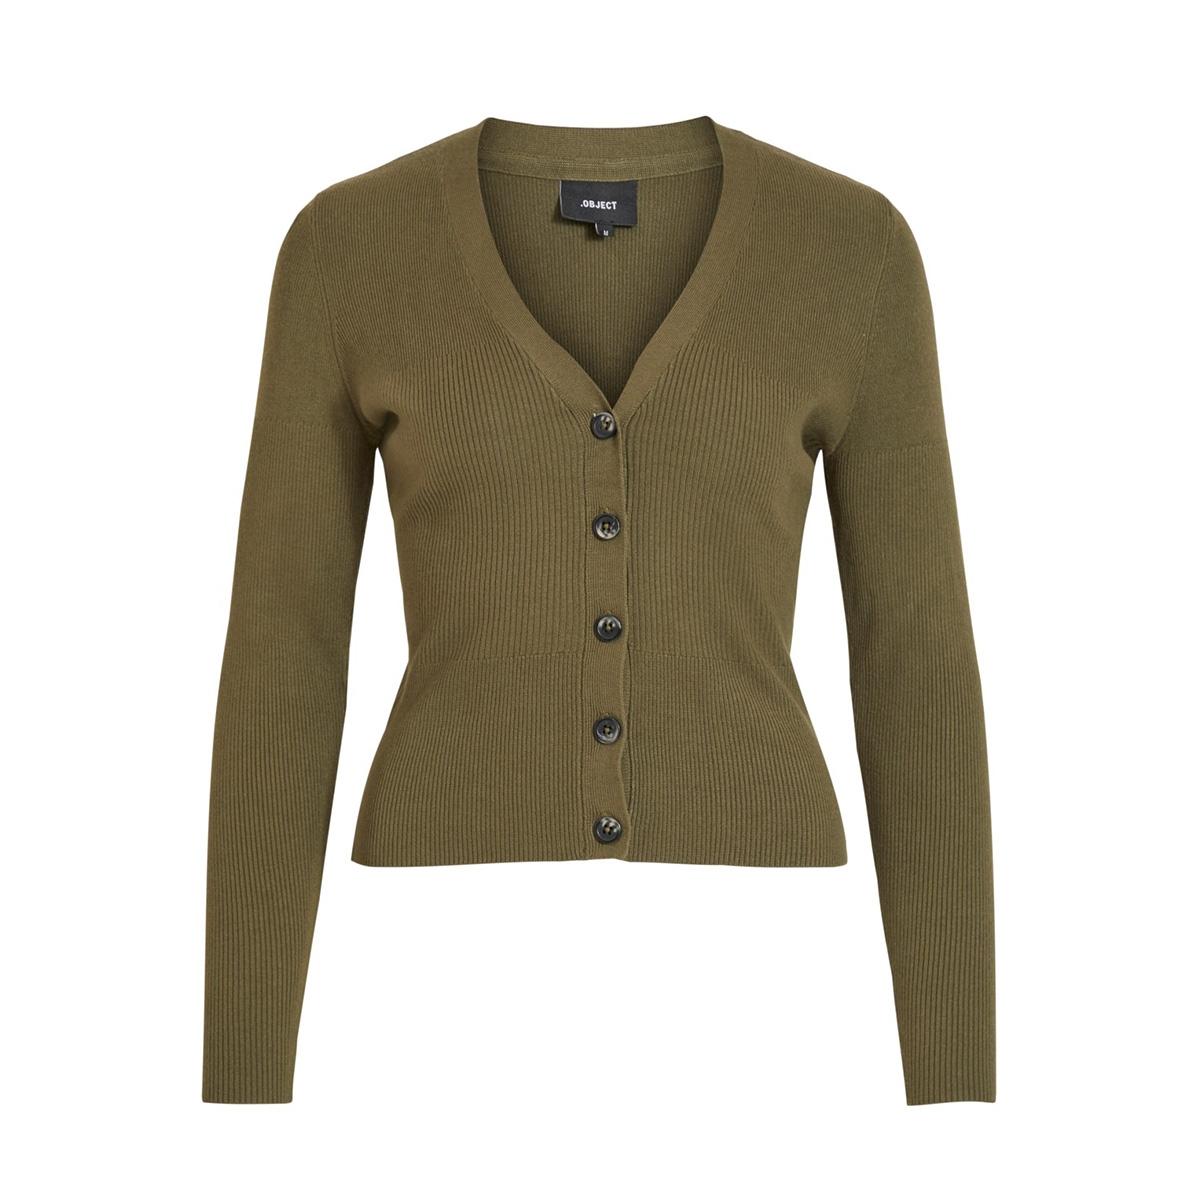 objnina l/s short knit cardigan noo 23031375 object vest burnt olive